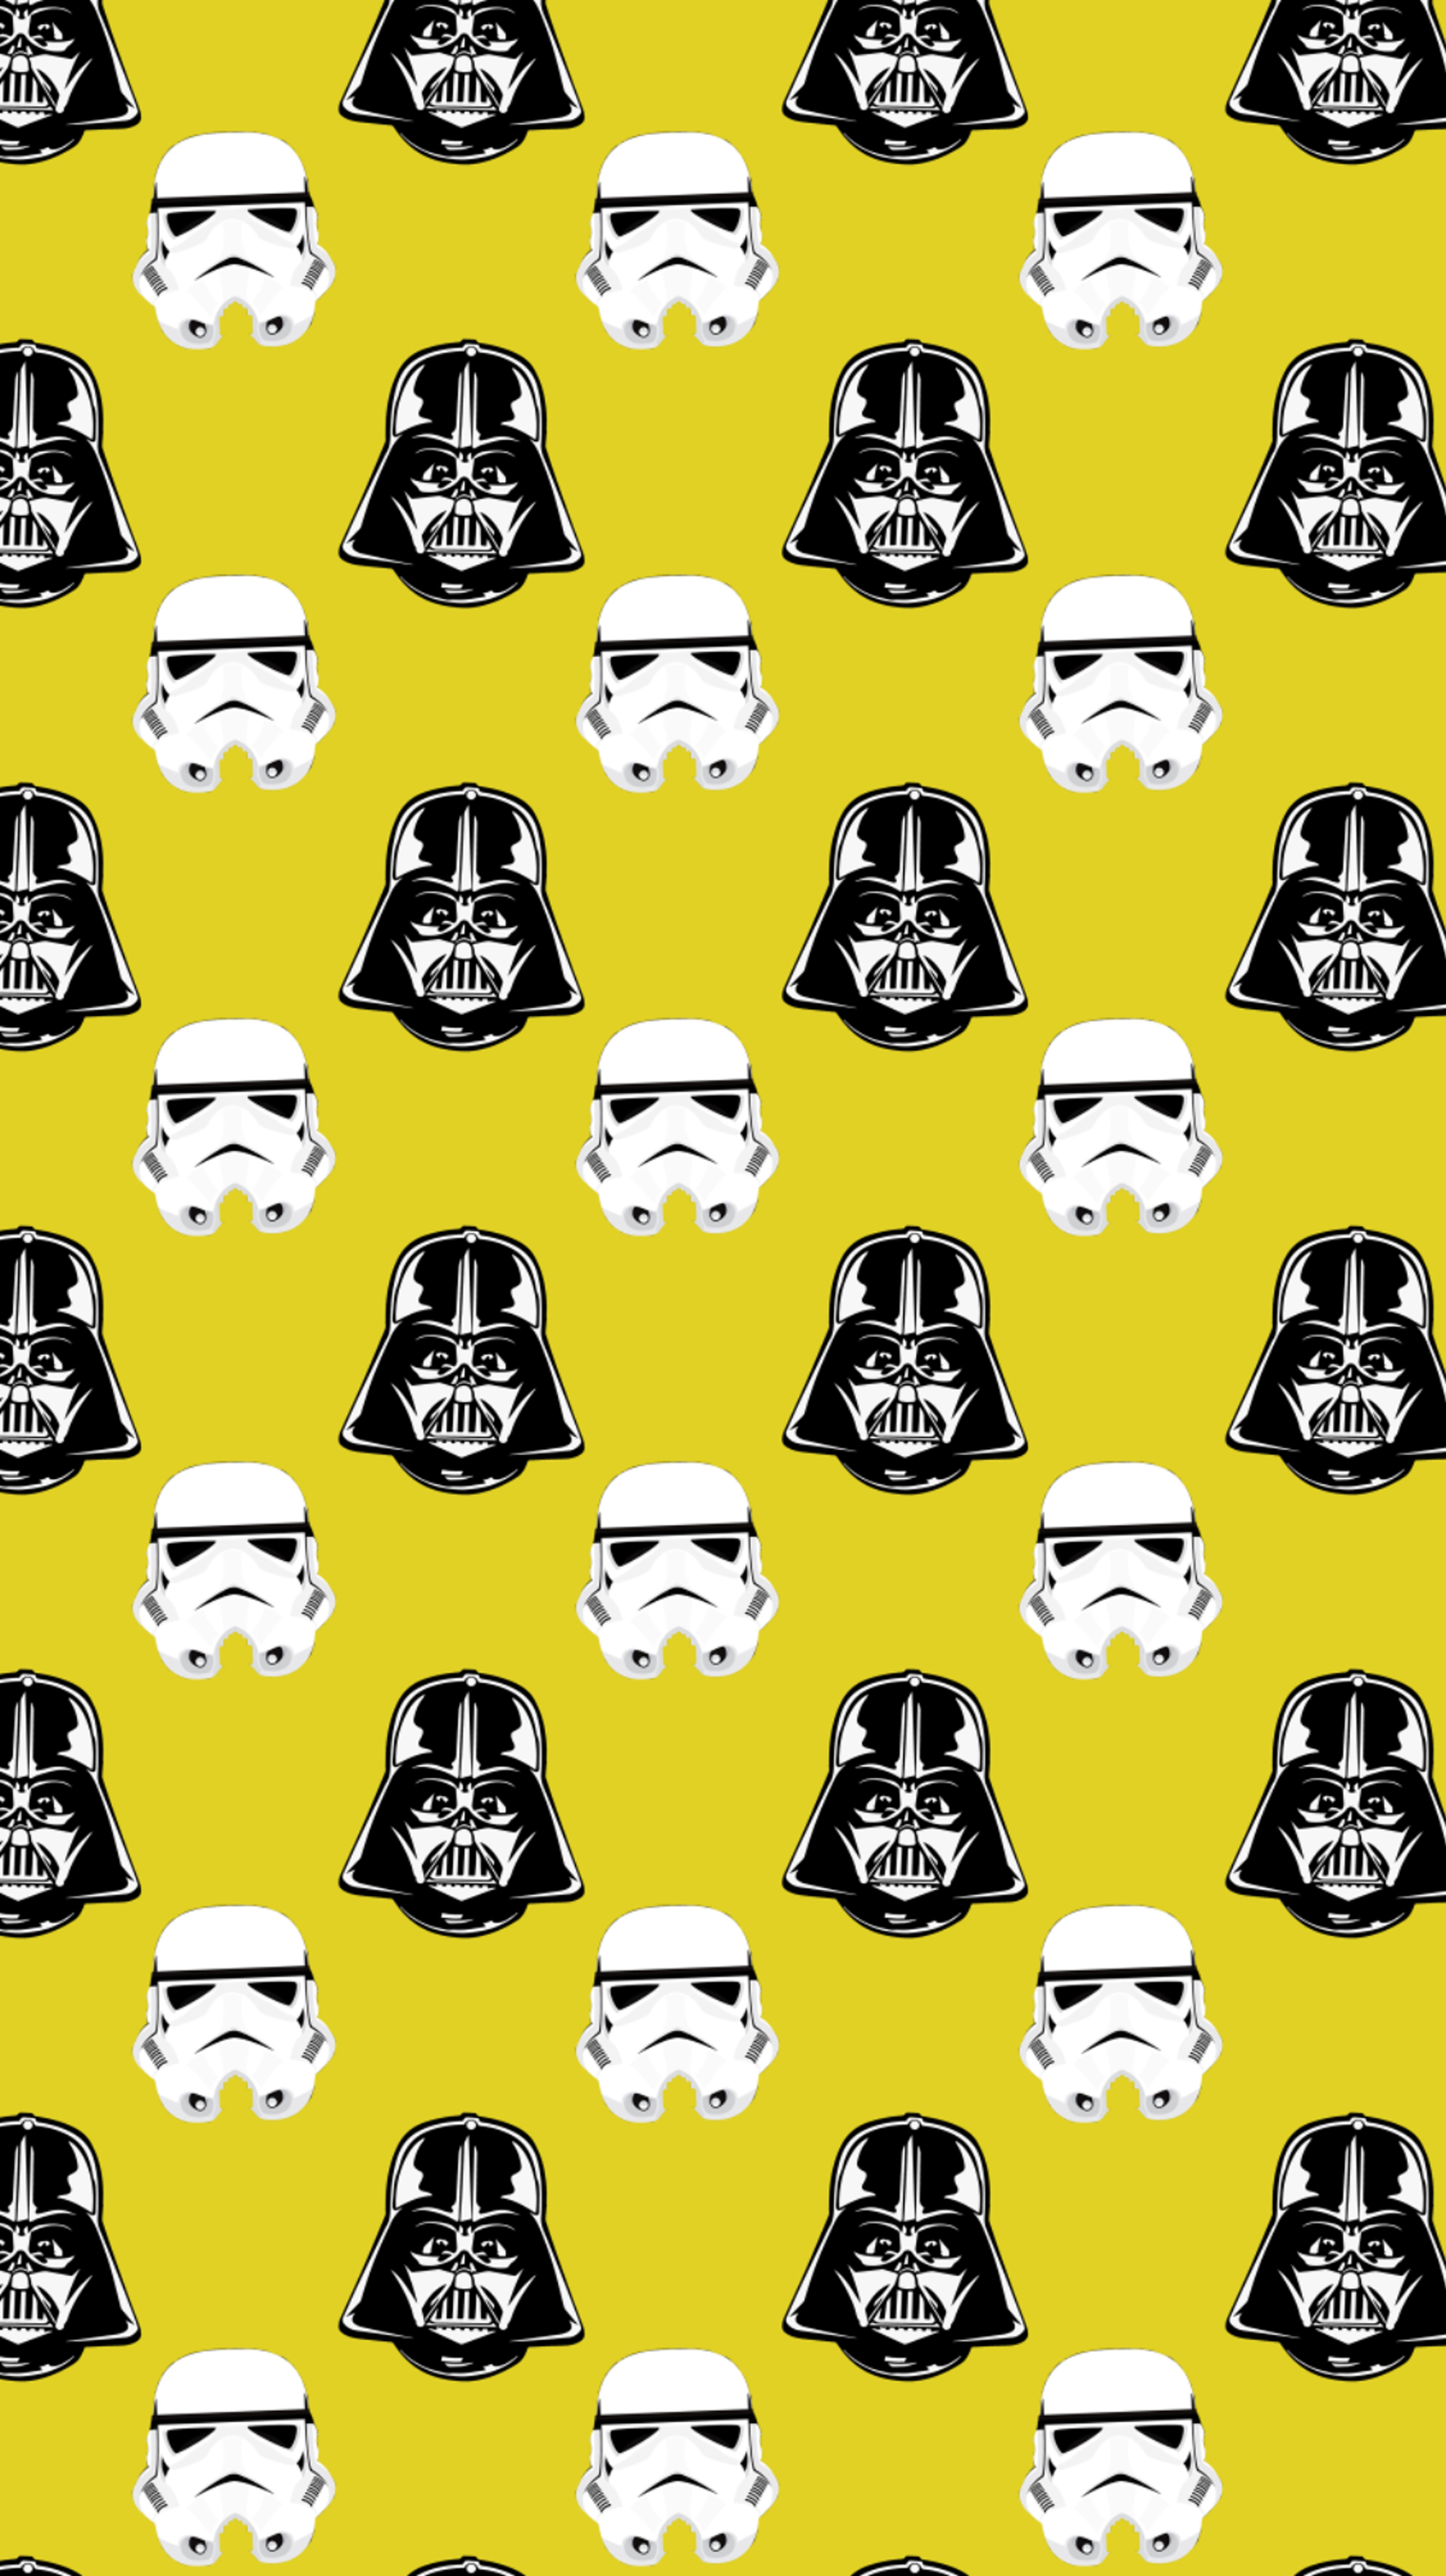 Star Wars Darth Vader Stormtrooper Pattern Yellow Yellow Background Wallpaper Resolution 3381x6024 Id 575901 Wallha Com